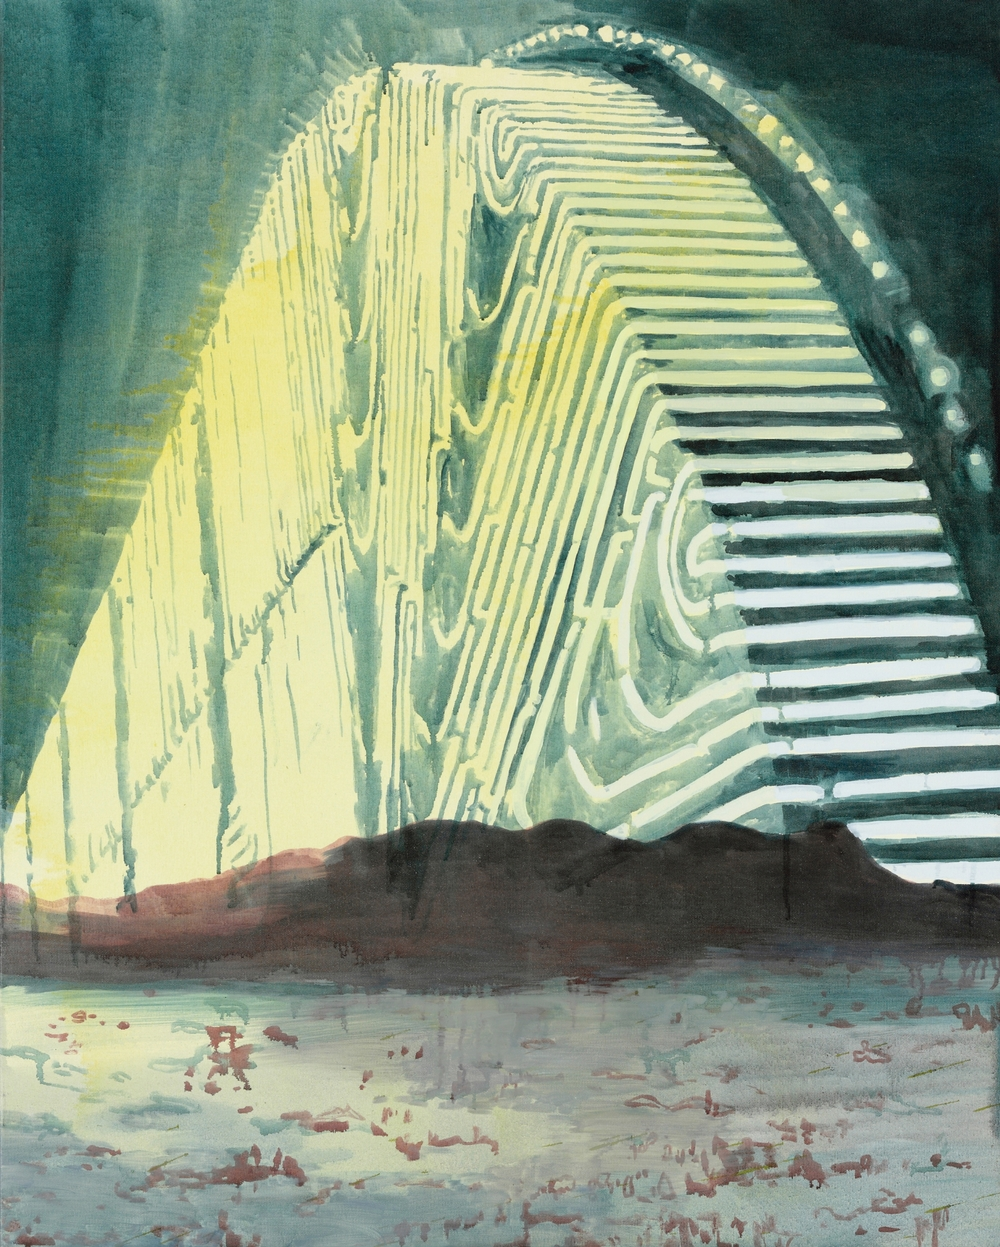 Nightlight, 2010, 100 x 80 cm, oil on canvas